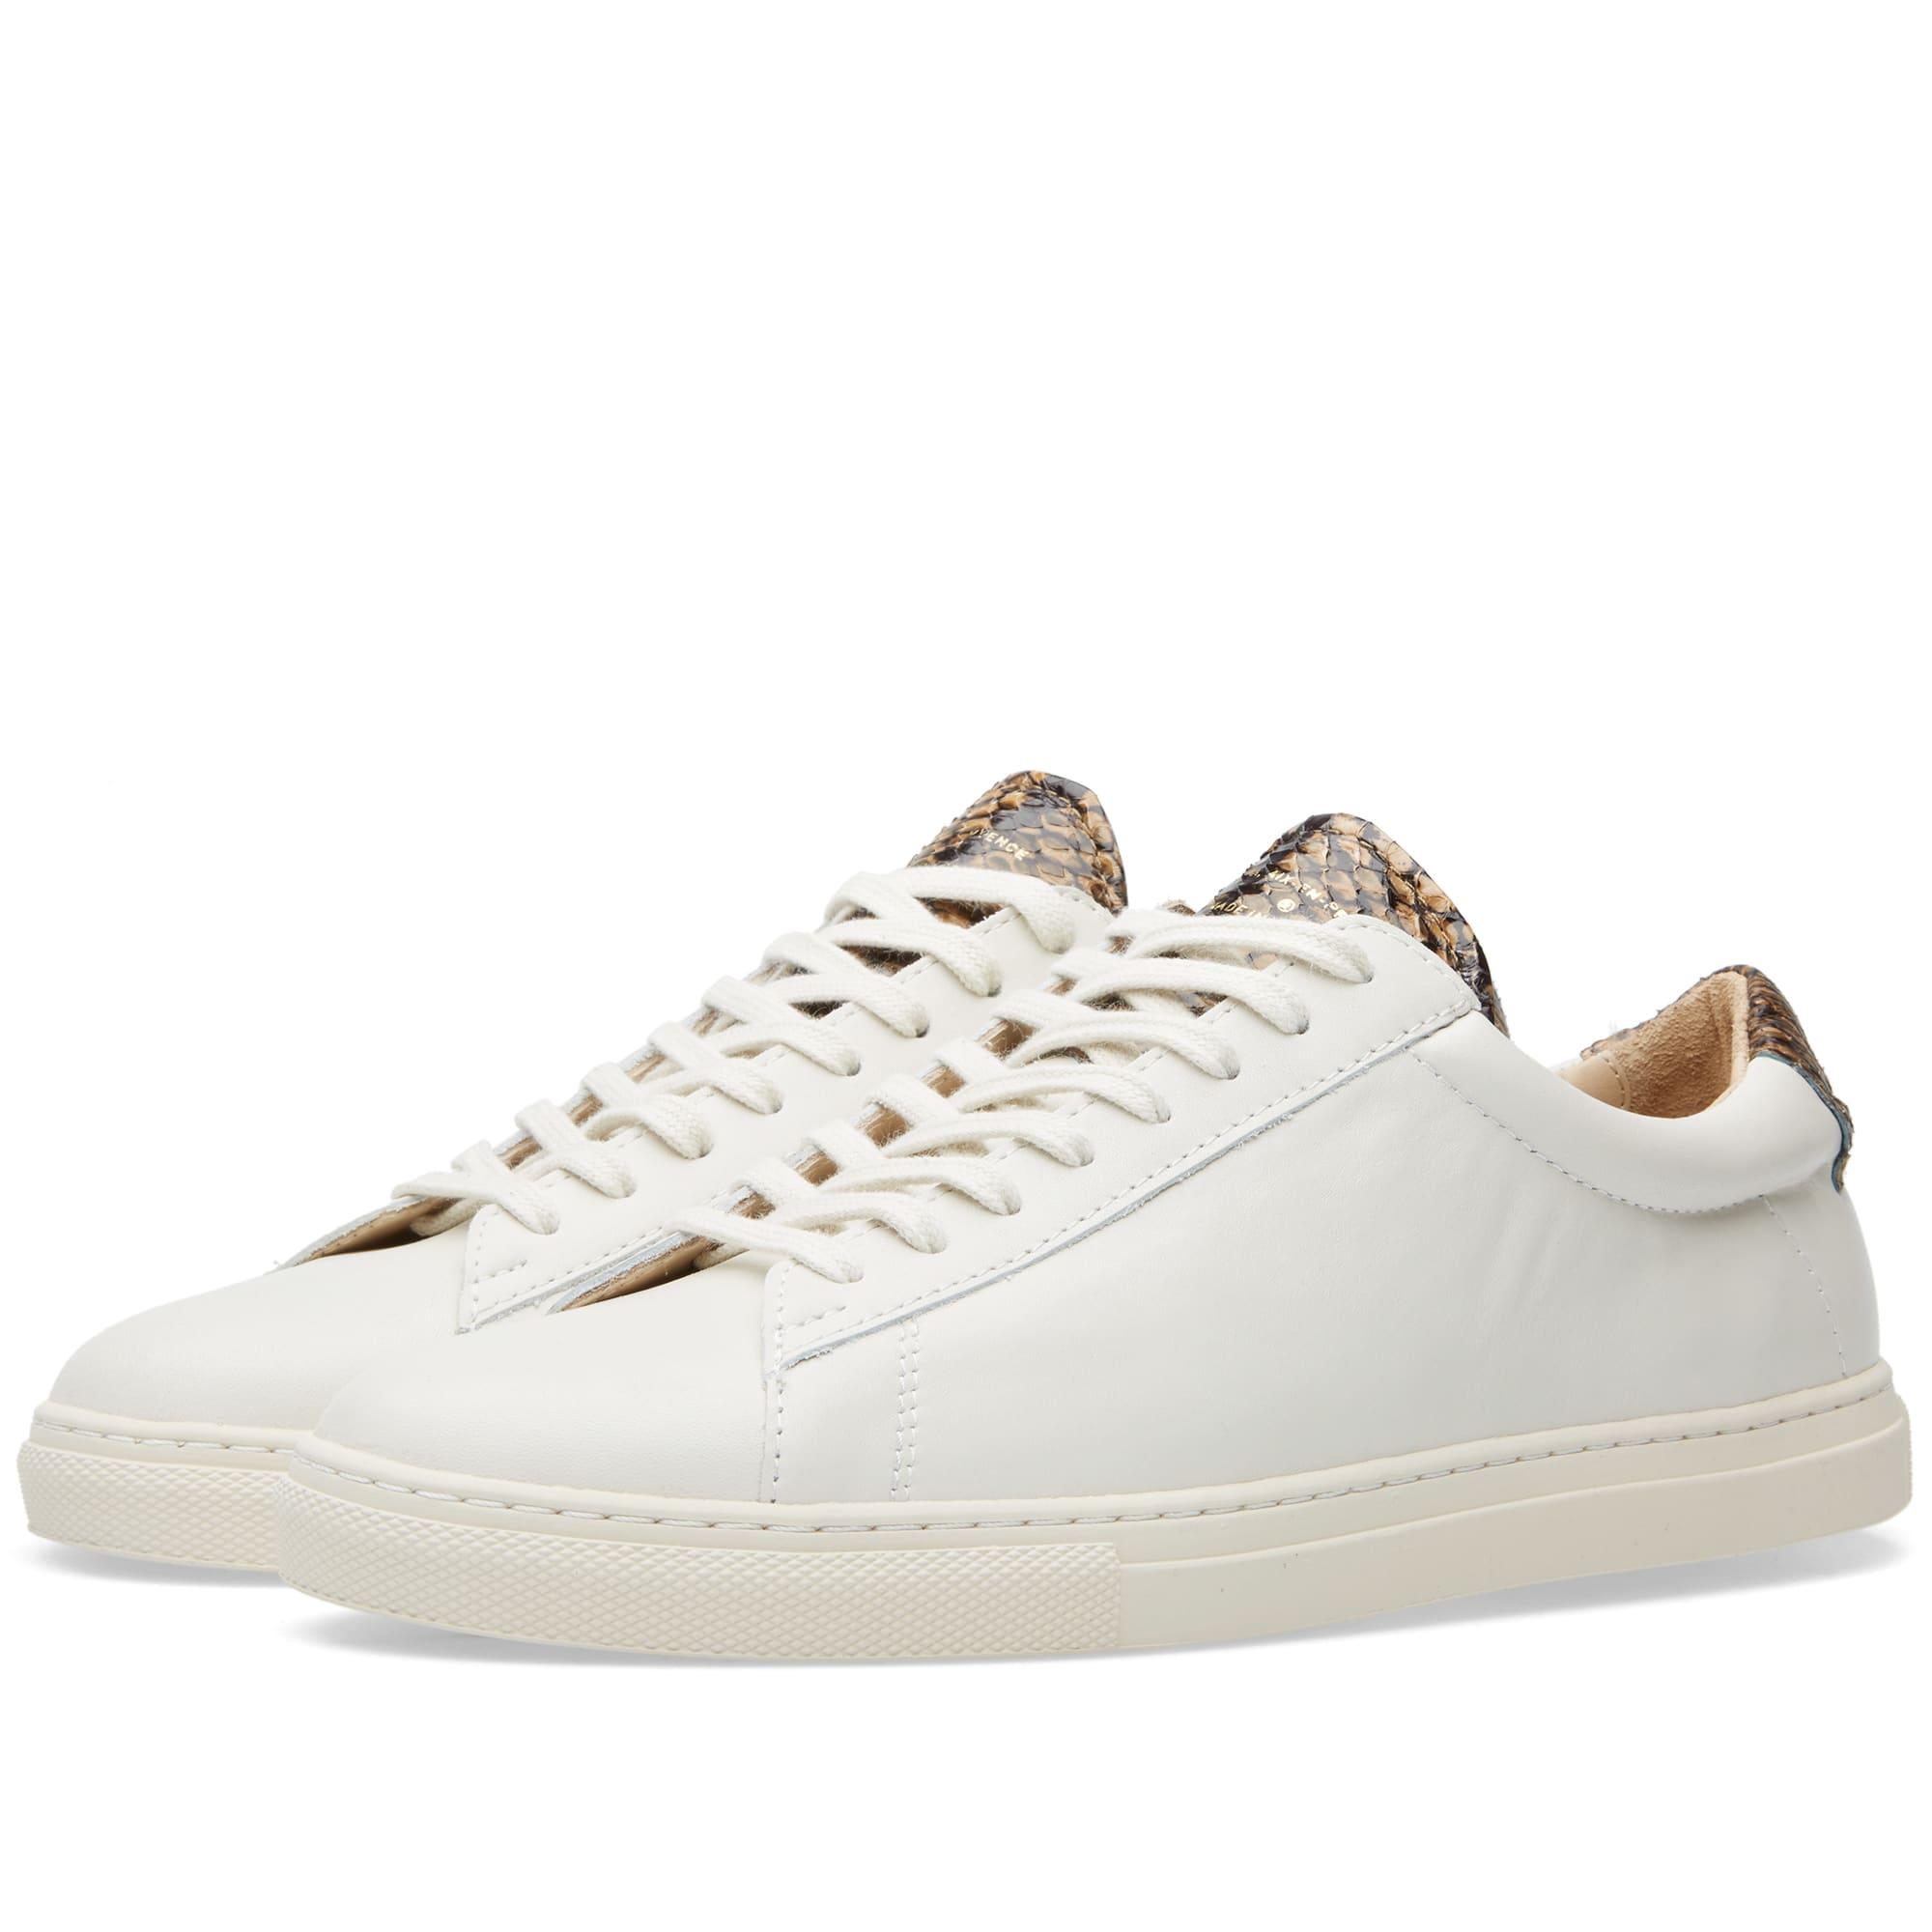 5c8ae25819c633 Zespa ZSP4 Sneaker Off White Nappa & Snake | END.